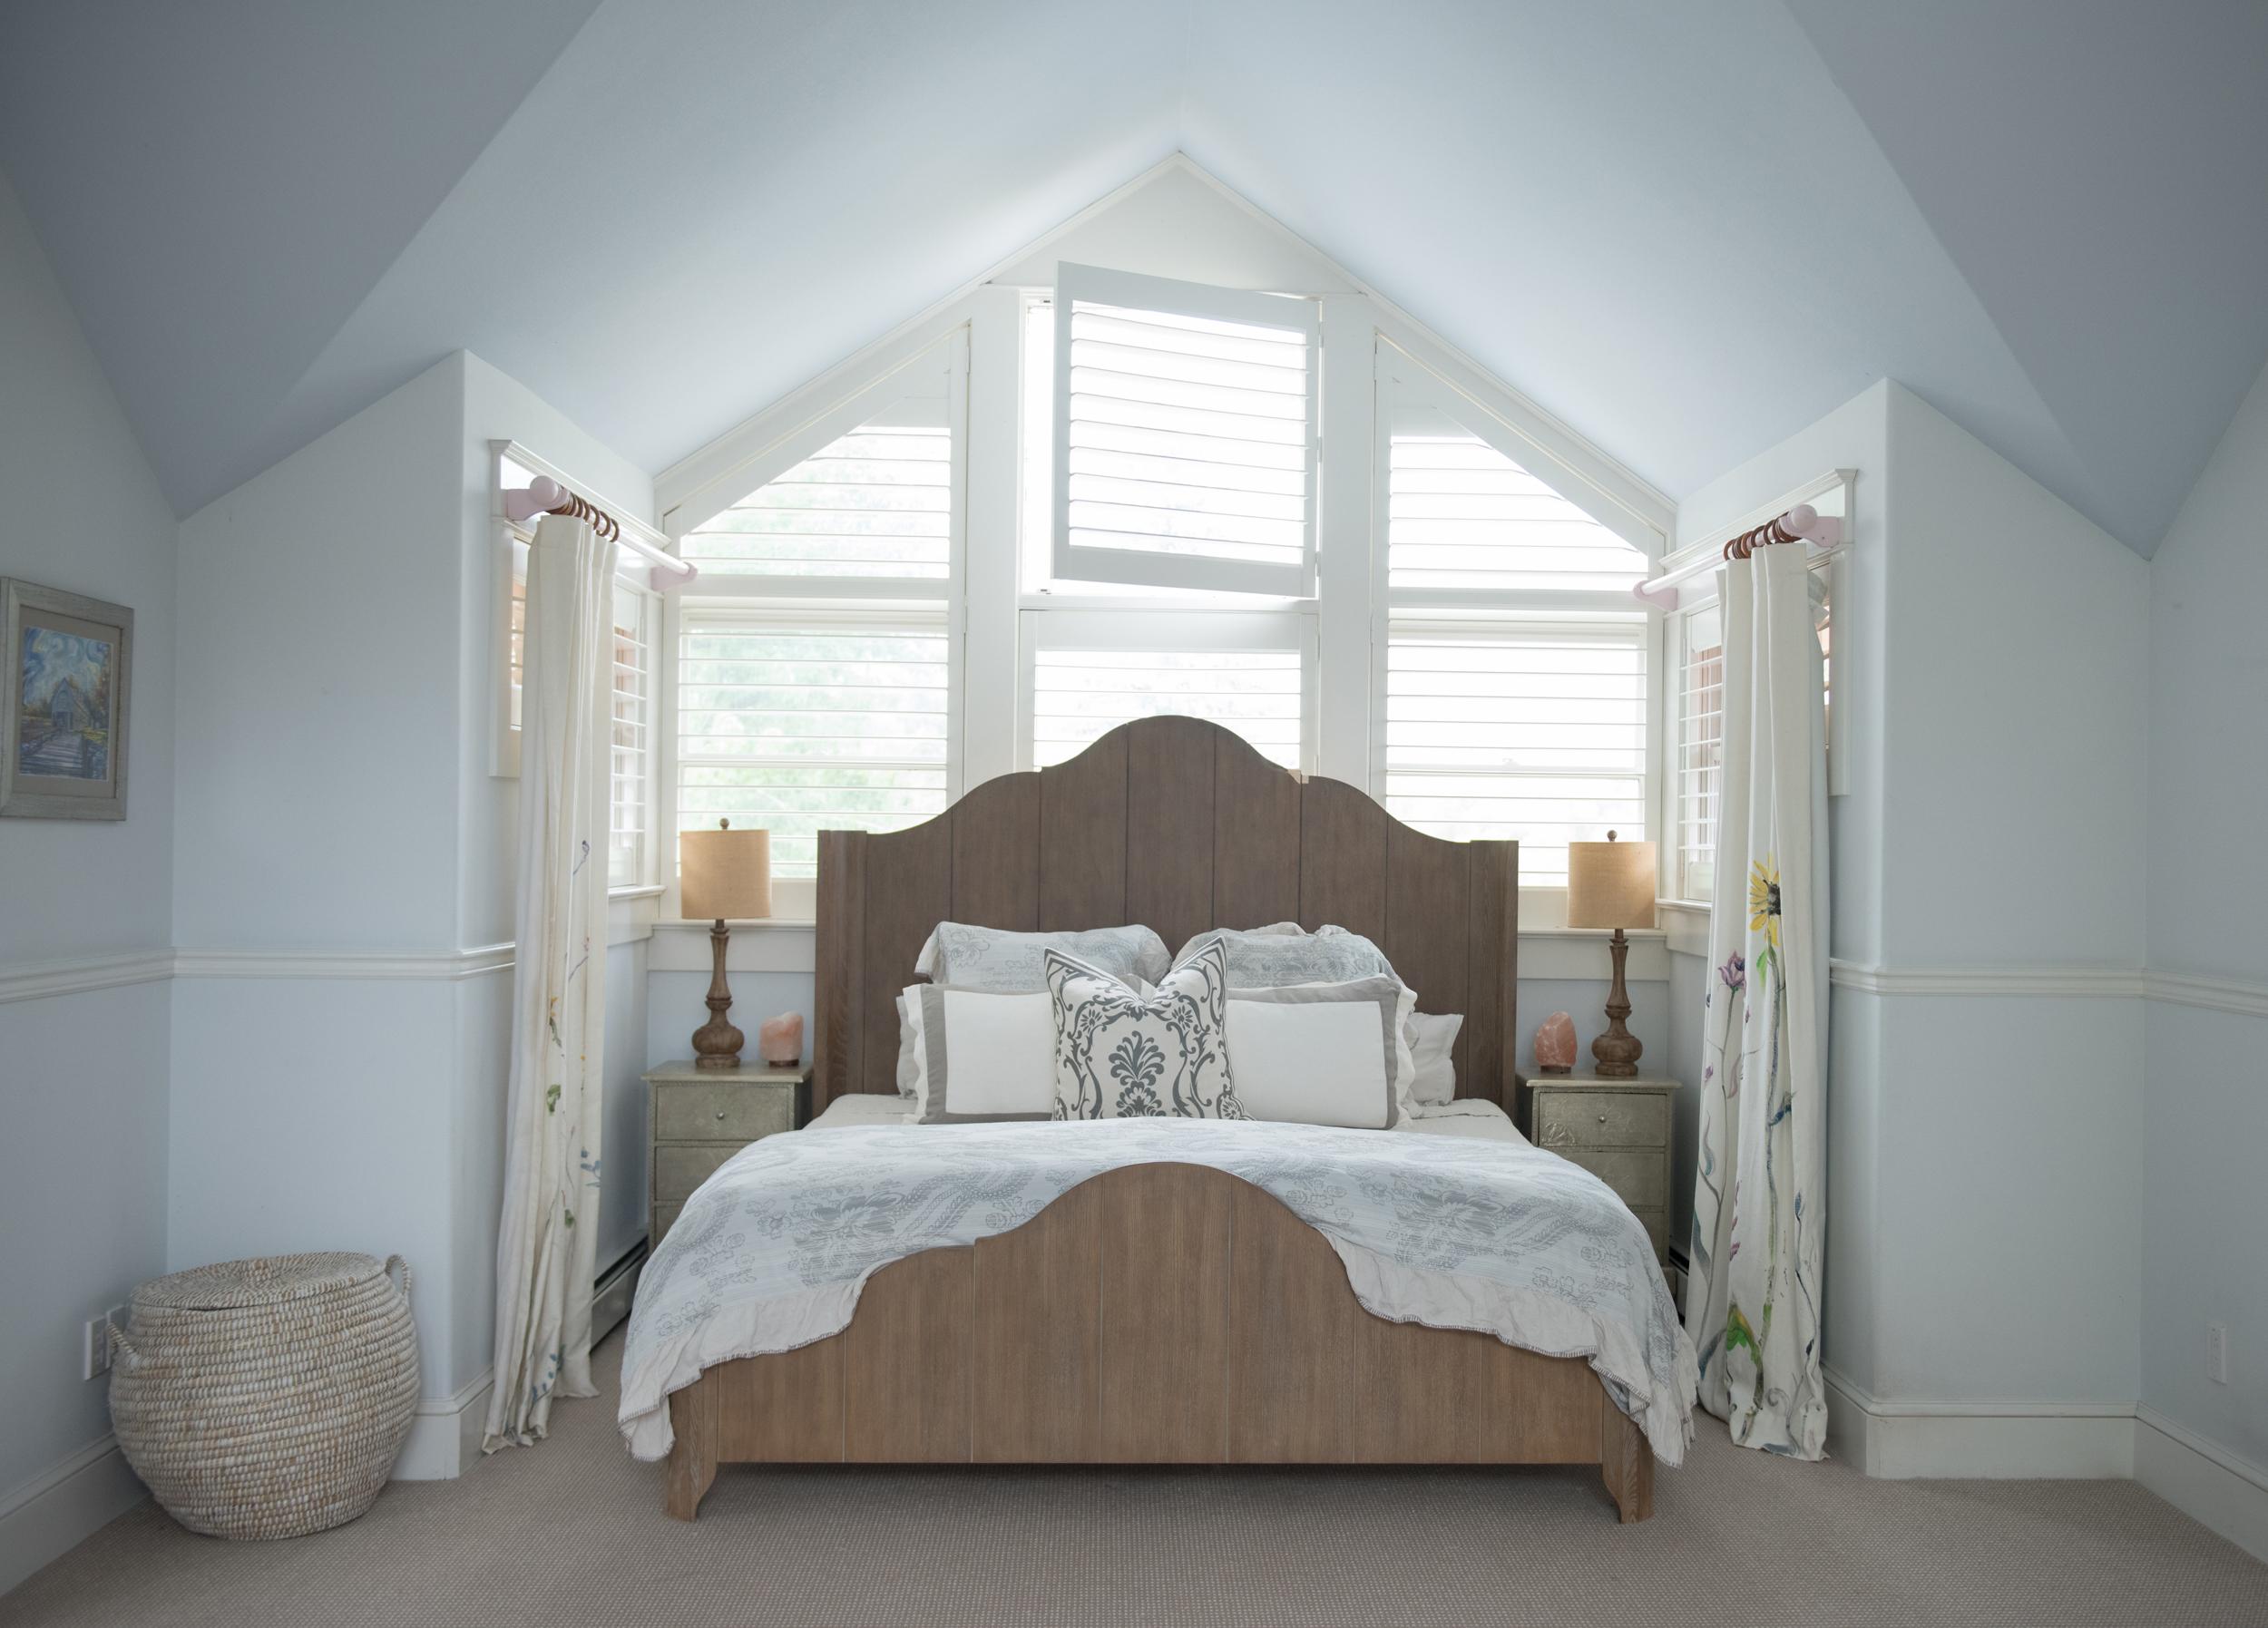 interior-design-aug2018-108.jpg